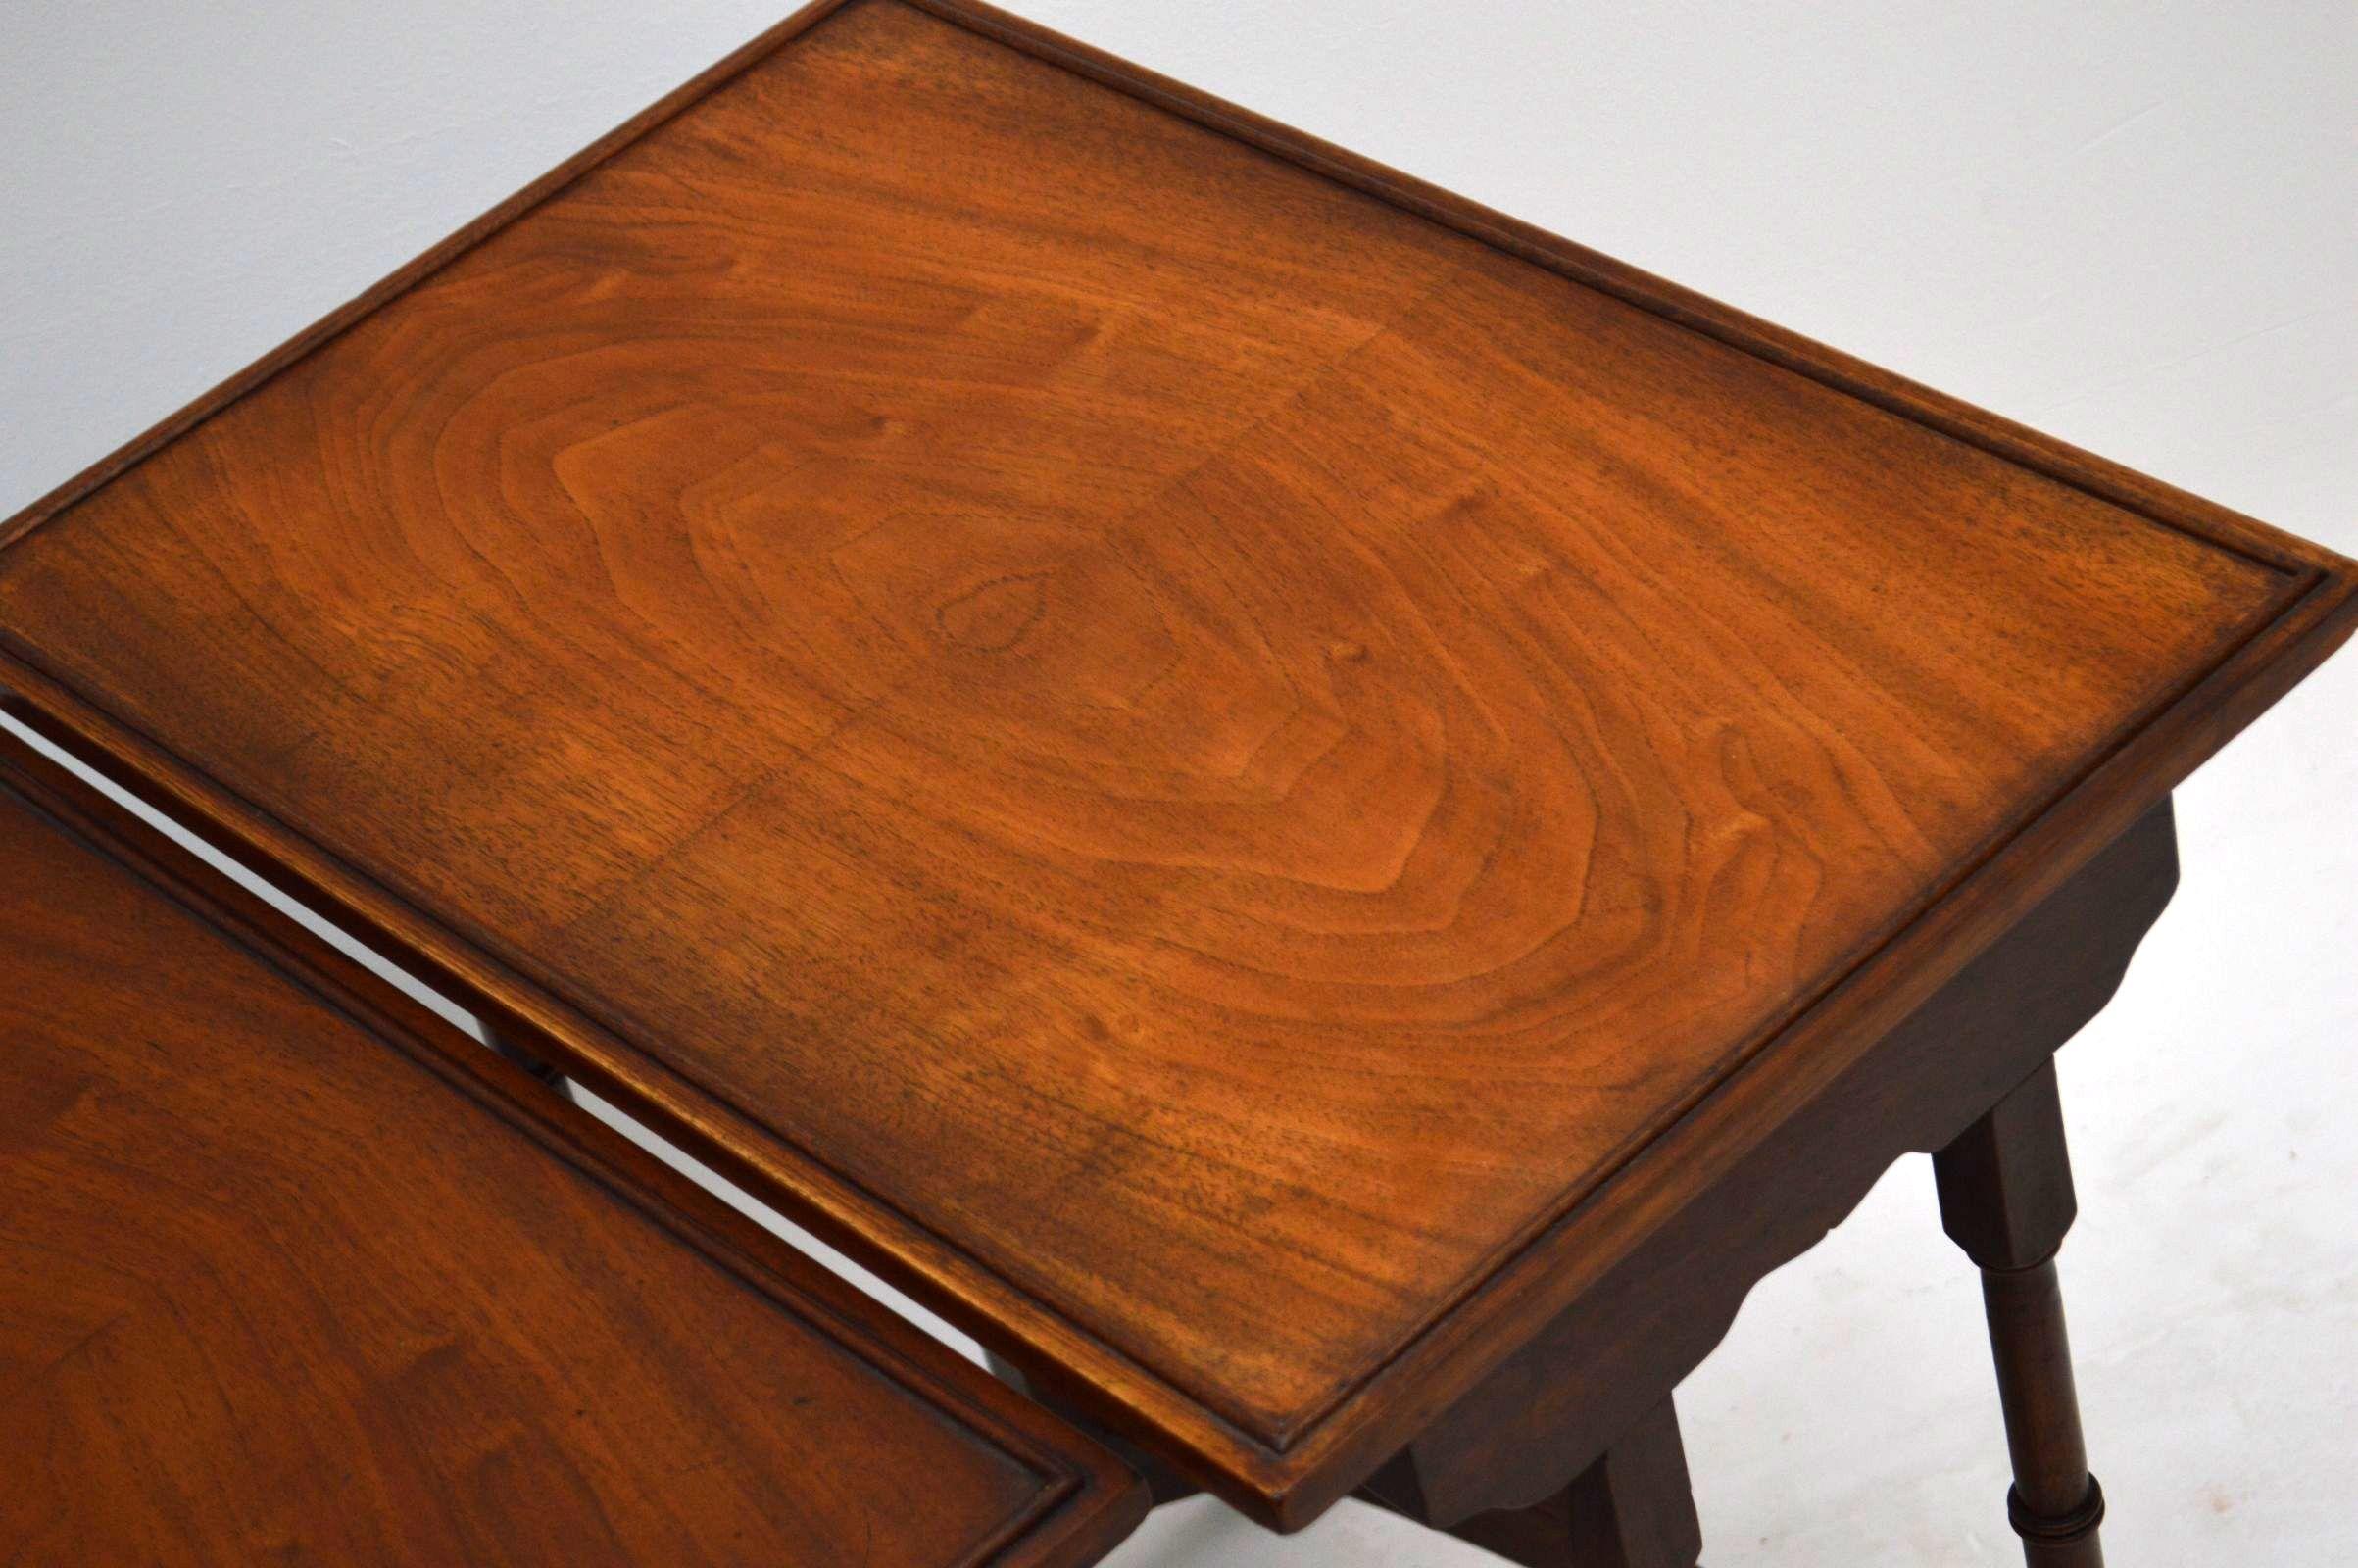 nest of tables antik beistelltische. Black Bedroom Furniture Sets. Home Design Ideas